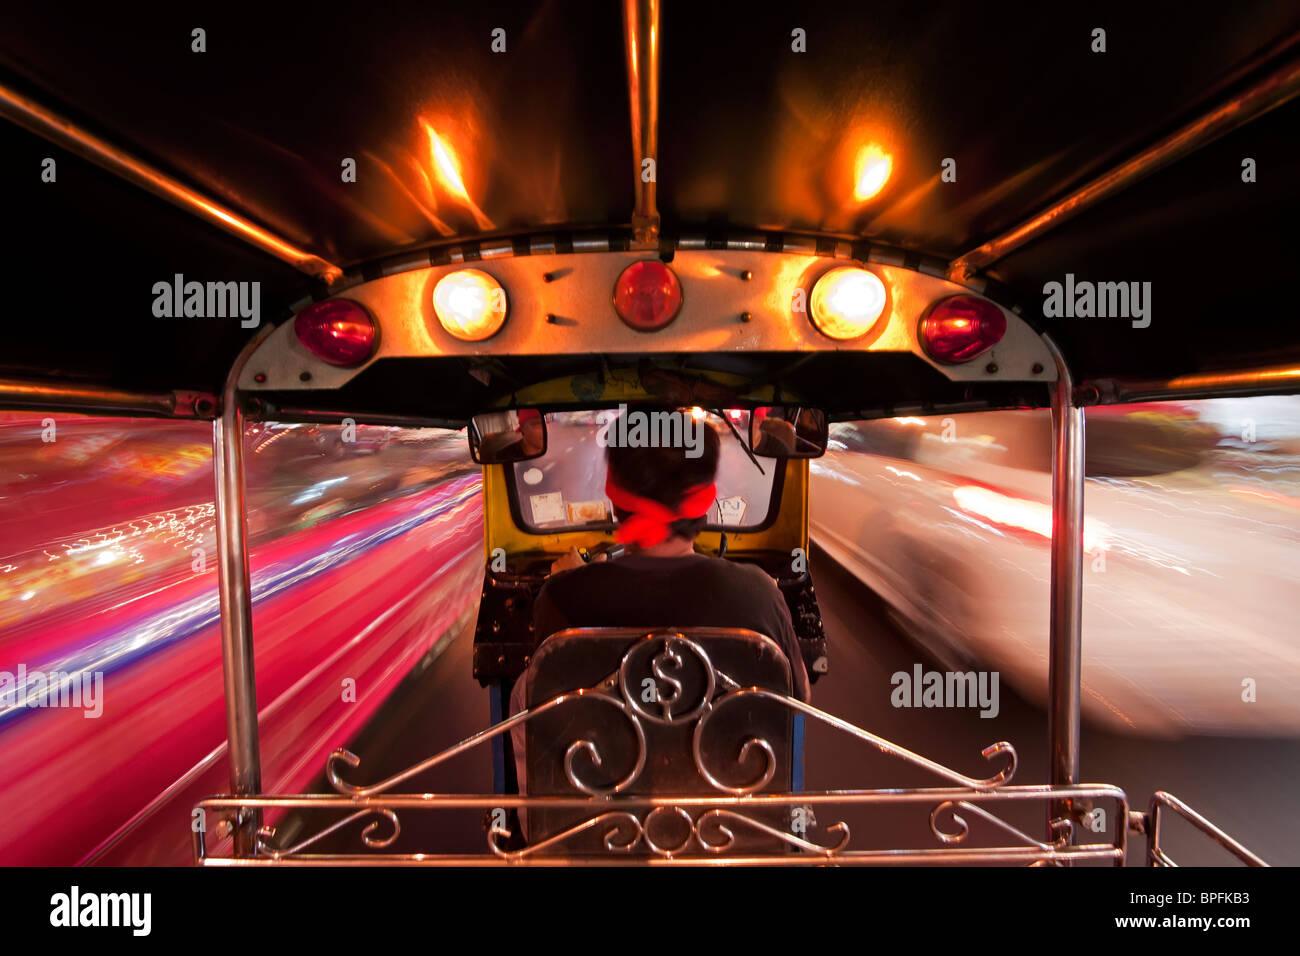 Tuk Tuk oder Auto-Rikscha in Bewegung bei Nacht, Bangkok, Thailand, Südostasien Stockbild